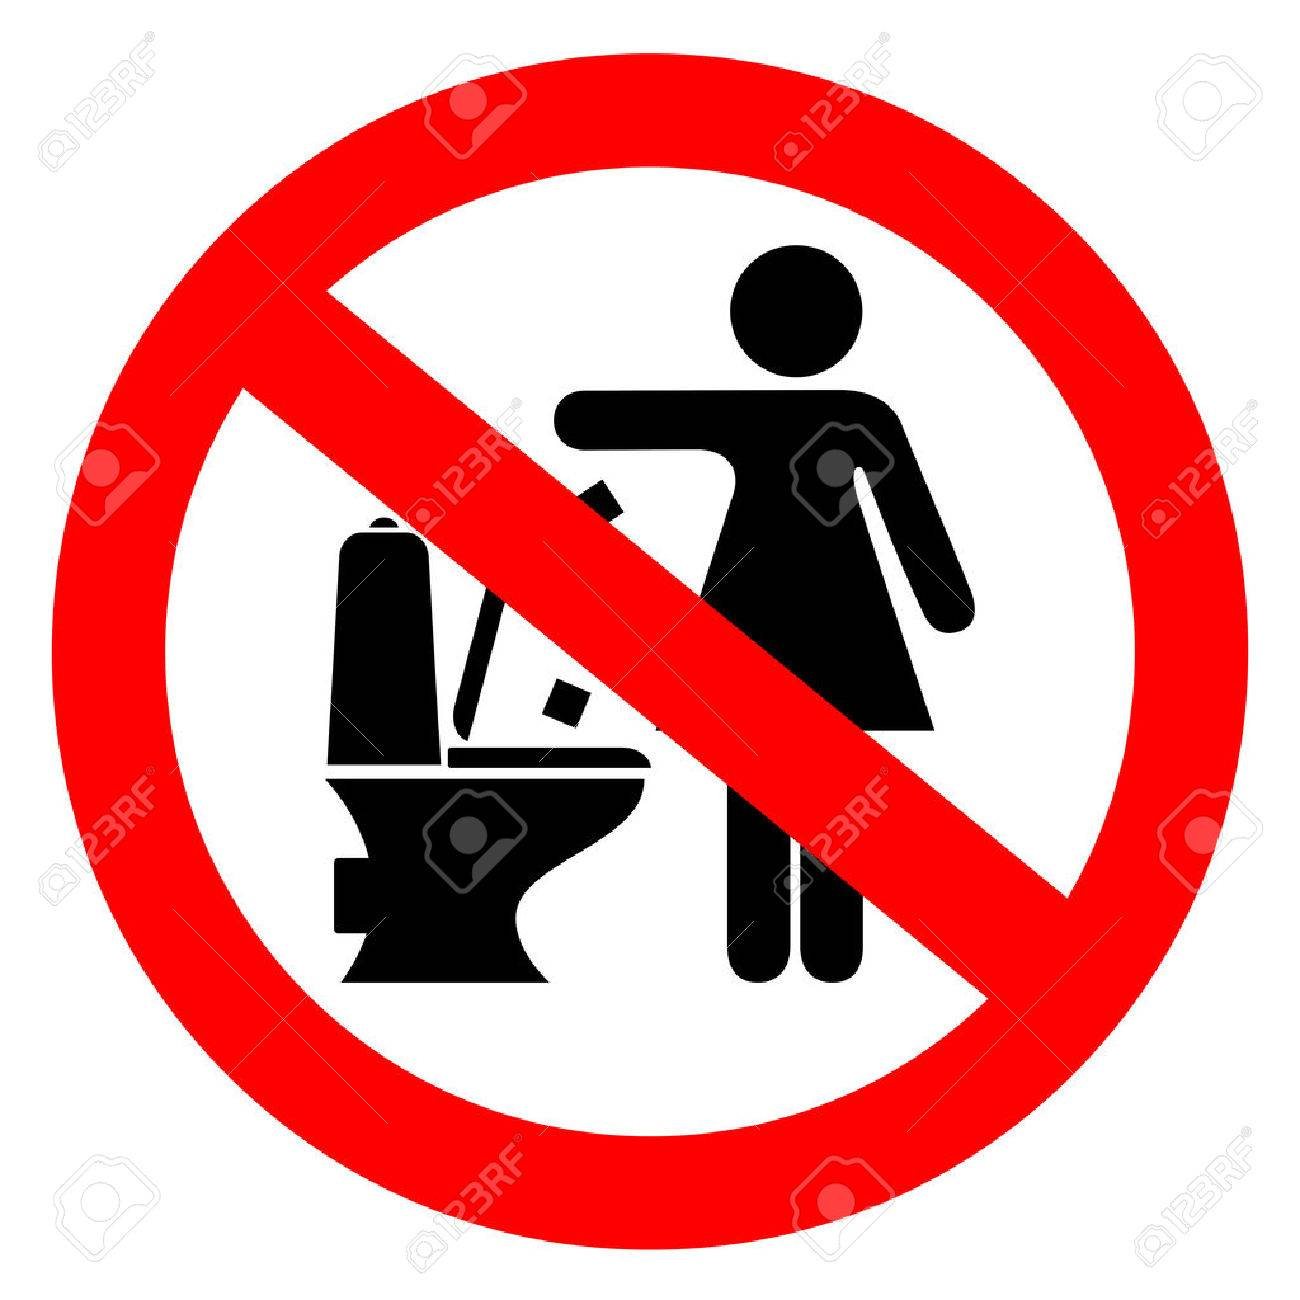 Do not flush feminine products sign - 76488453